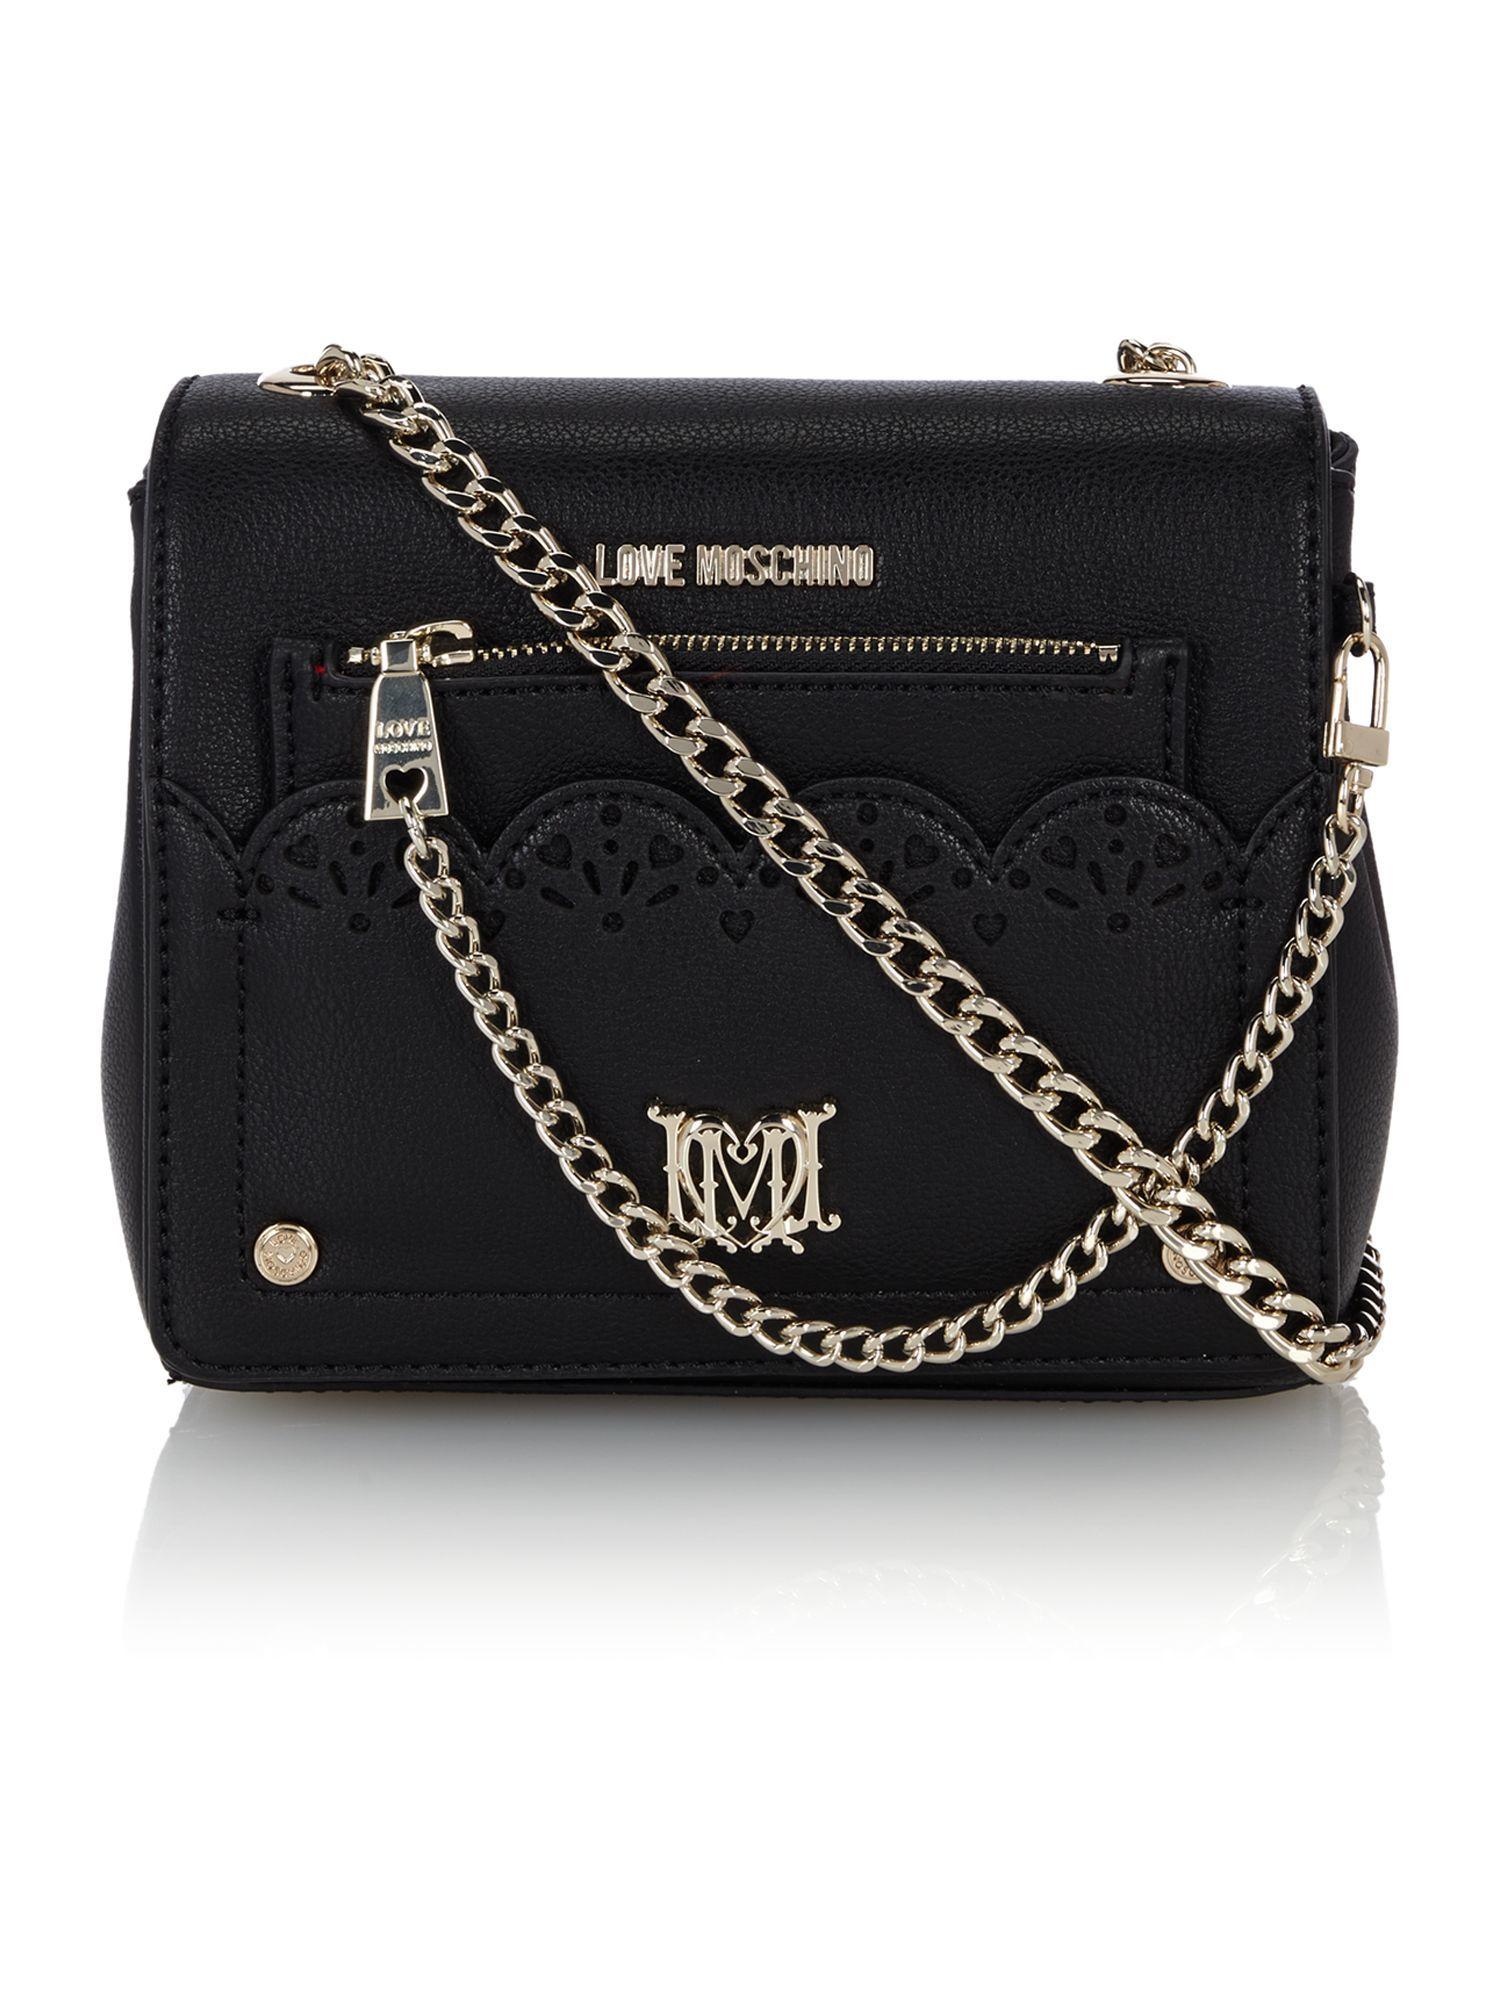 76abc192e67 Love moschino Black Small Cut Out Cross Body Bag in Black #bag ...